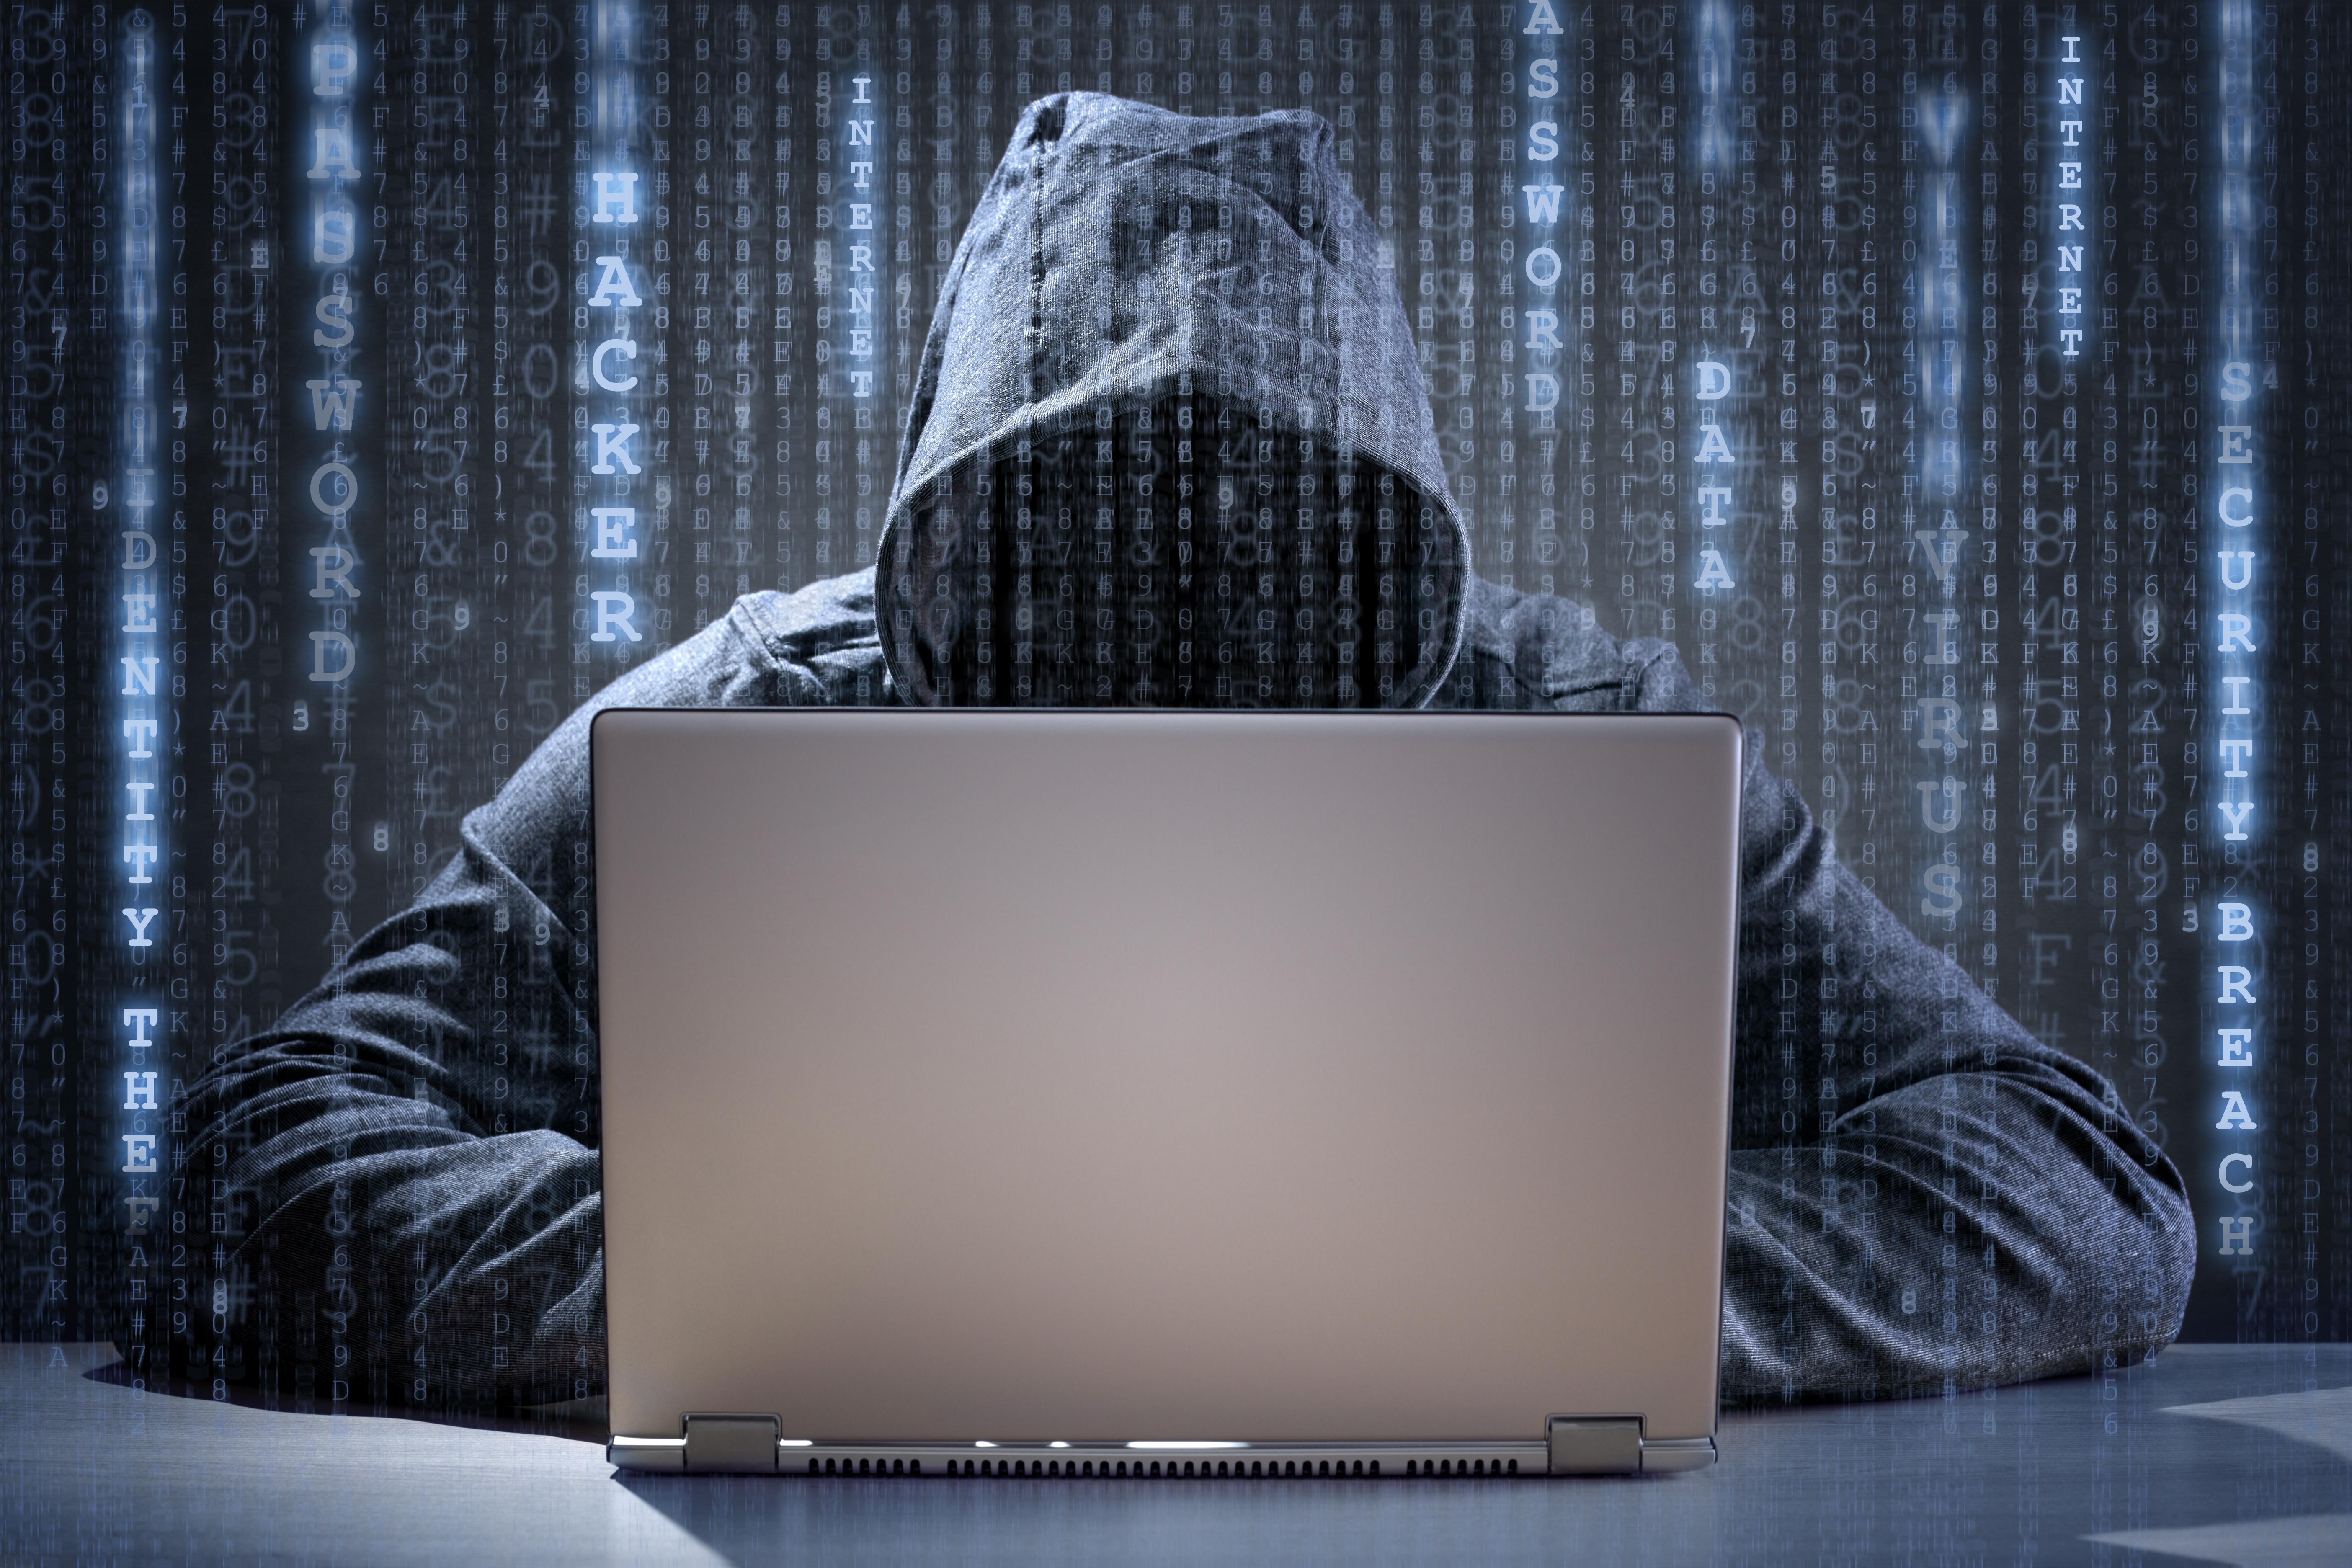 A computer hacker.